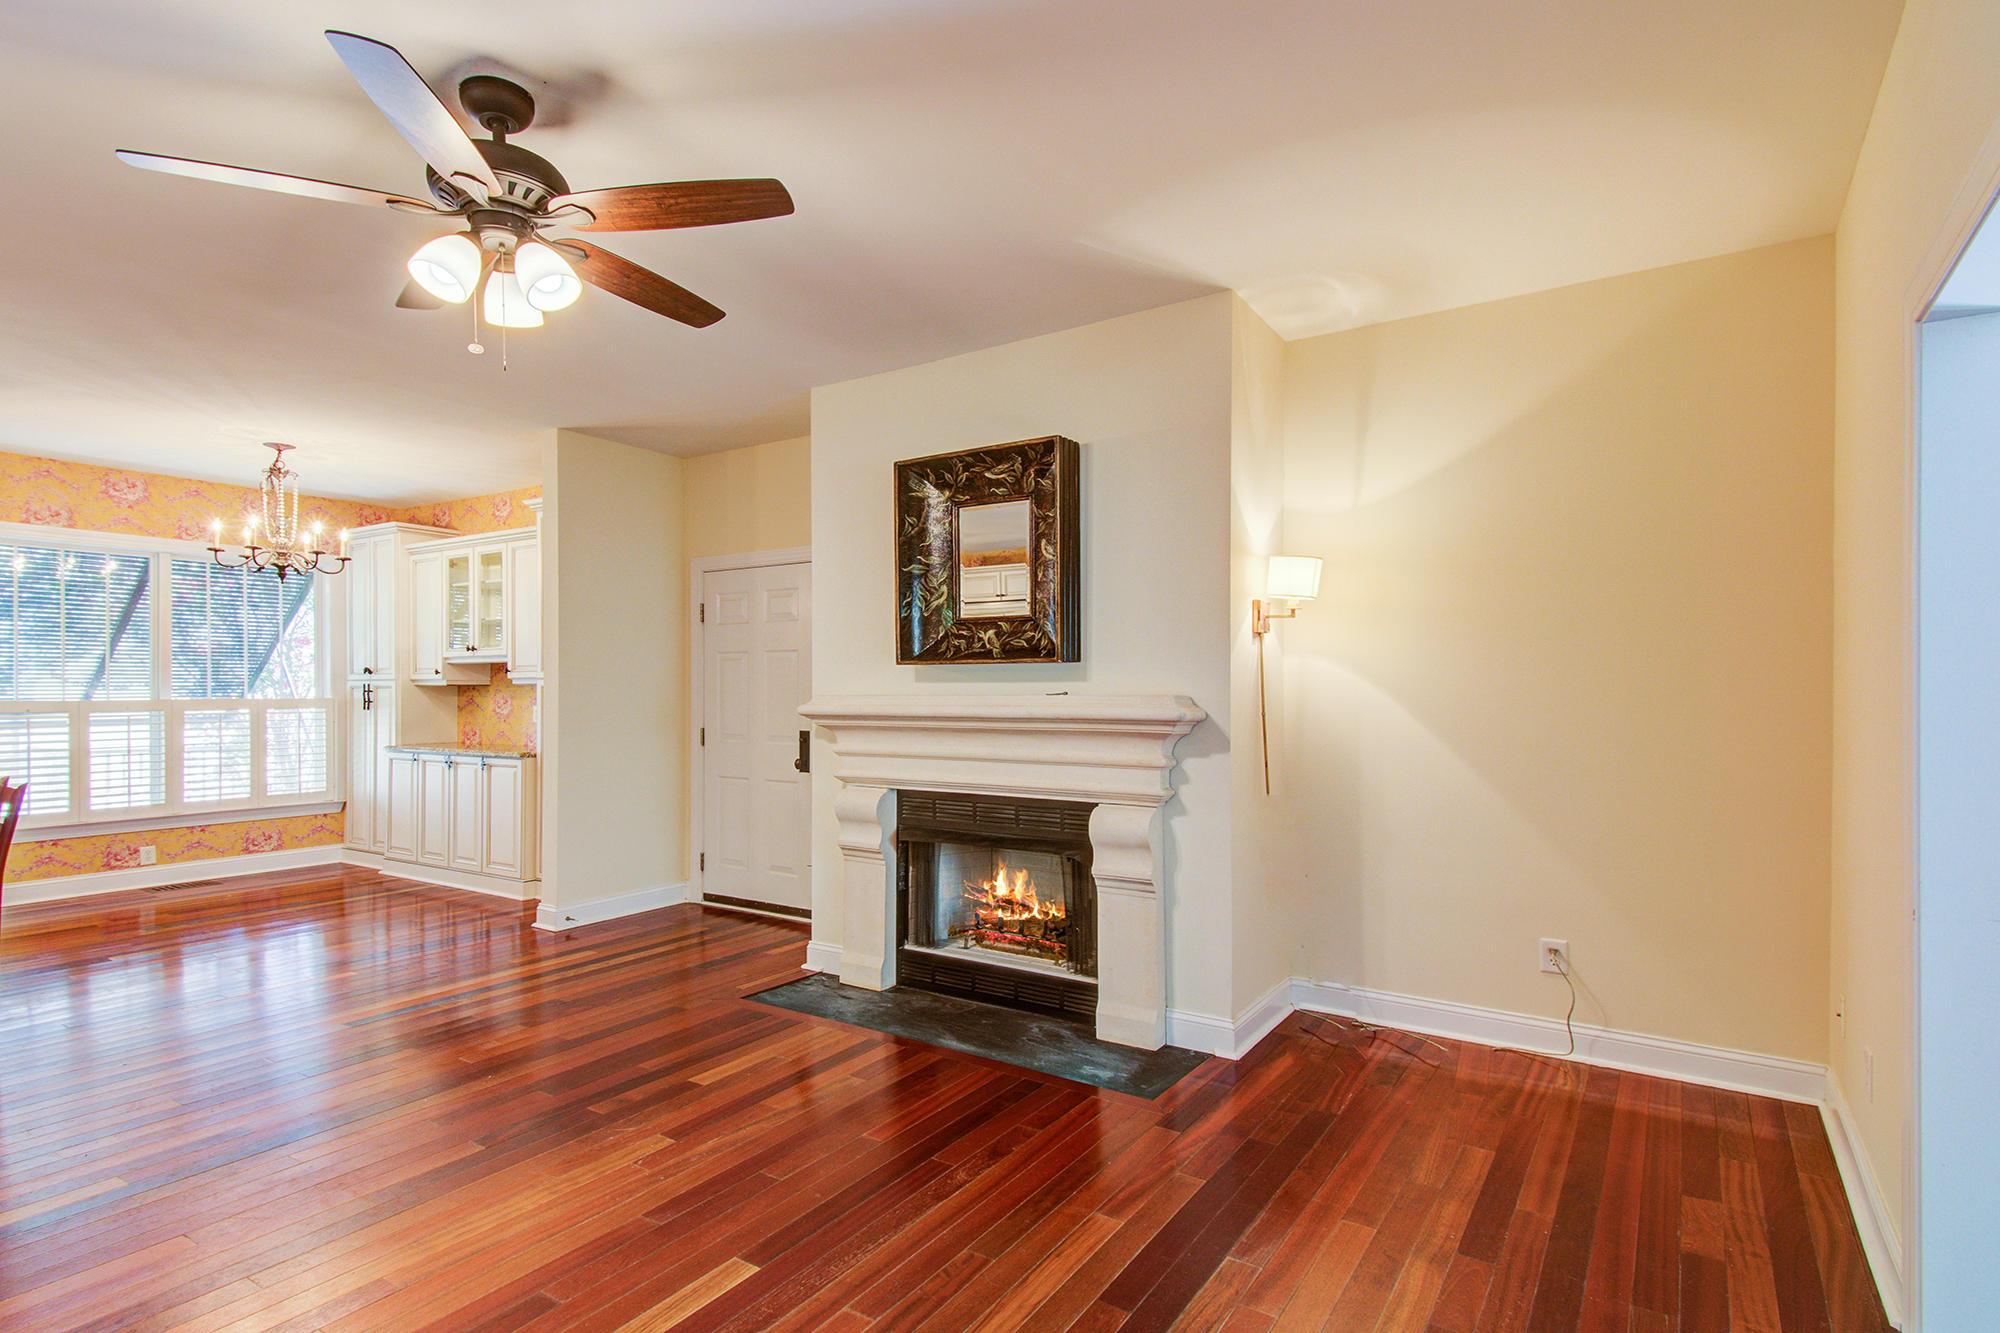 Center Park Homes For Sale - 950 Crossing, Daniel Island, SC - 58